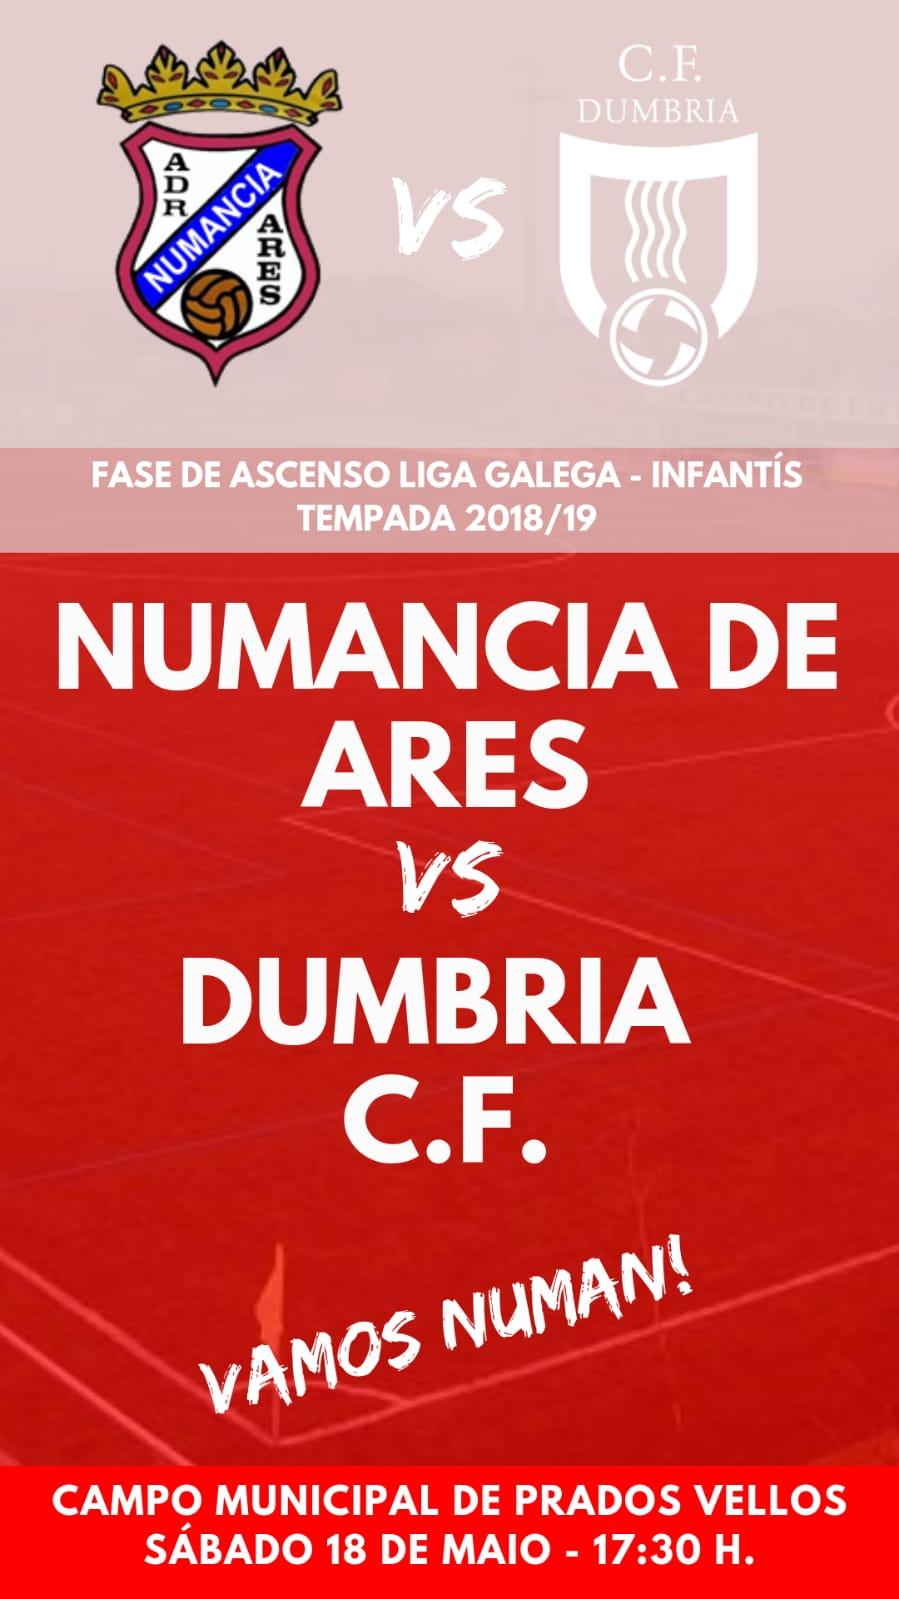 ADR Numancia de Ares. Fase de Ascenso Liga Gallega de Infantiles temporada 2018-2019.